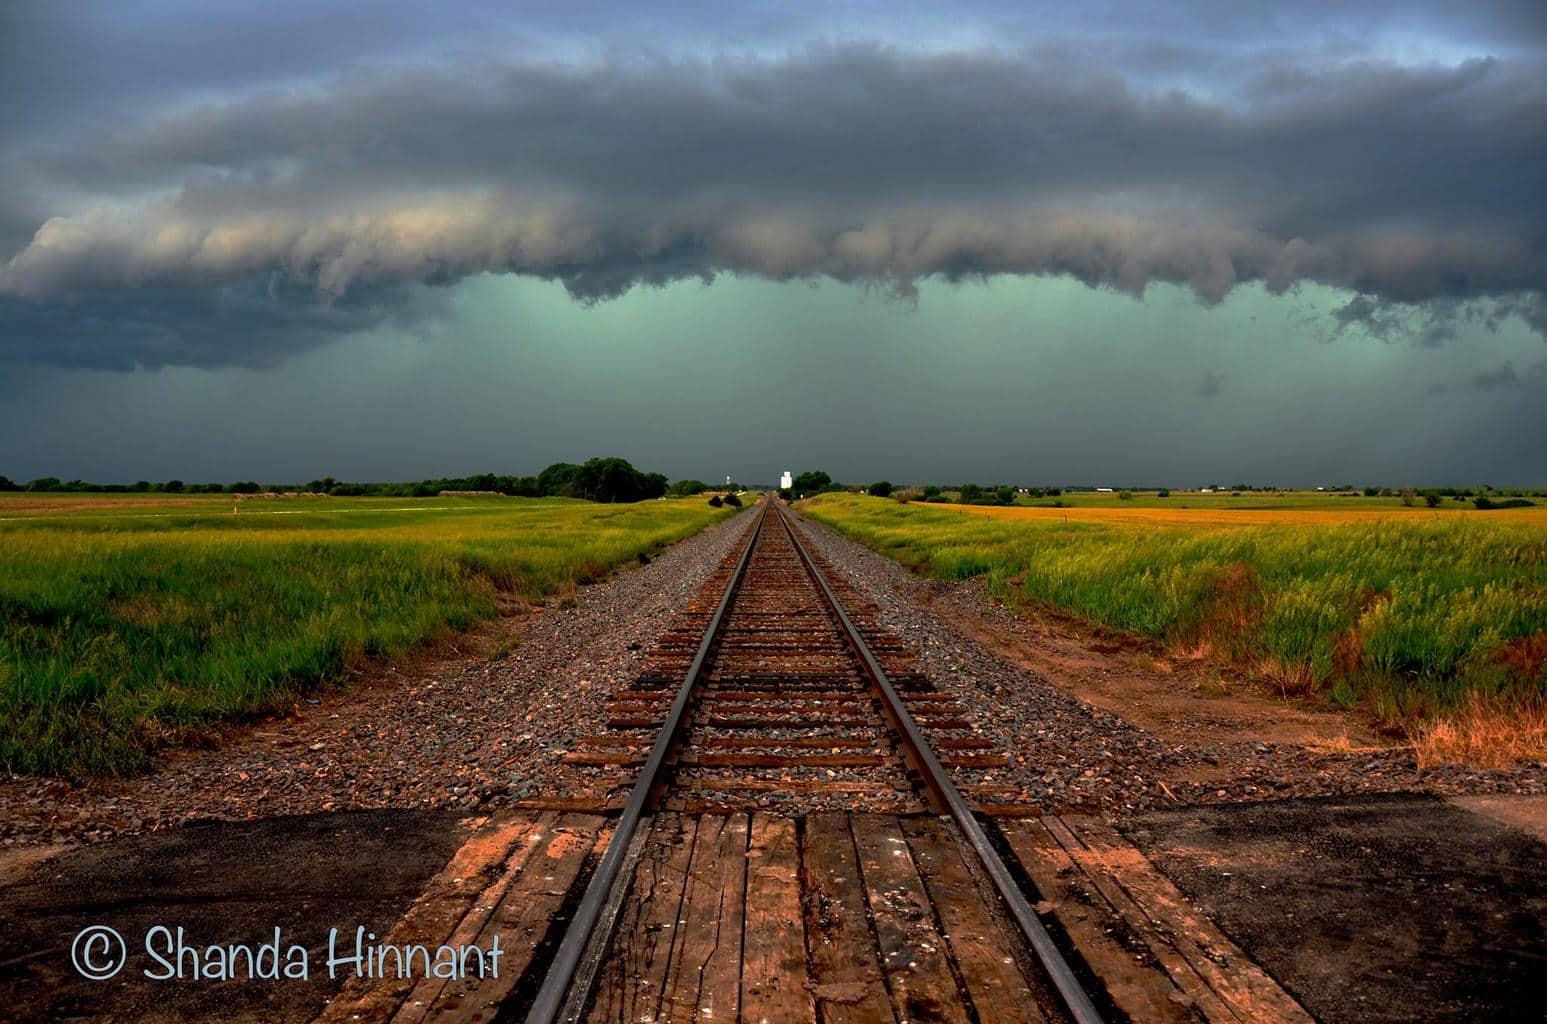 ARide into the storm. June 8, 2013 near Russell, Kansas.